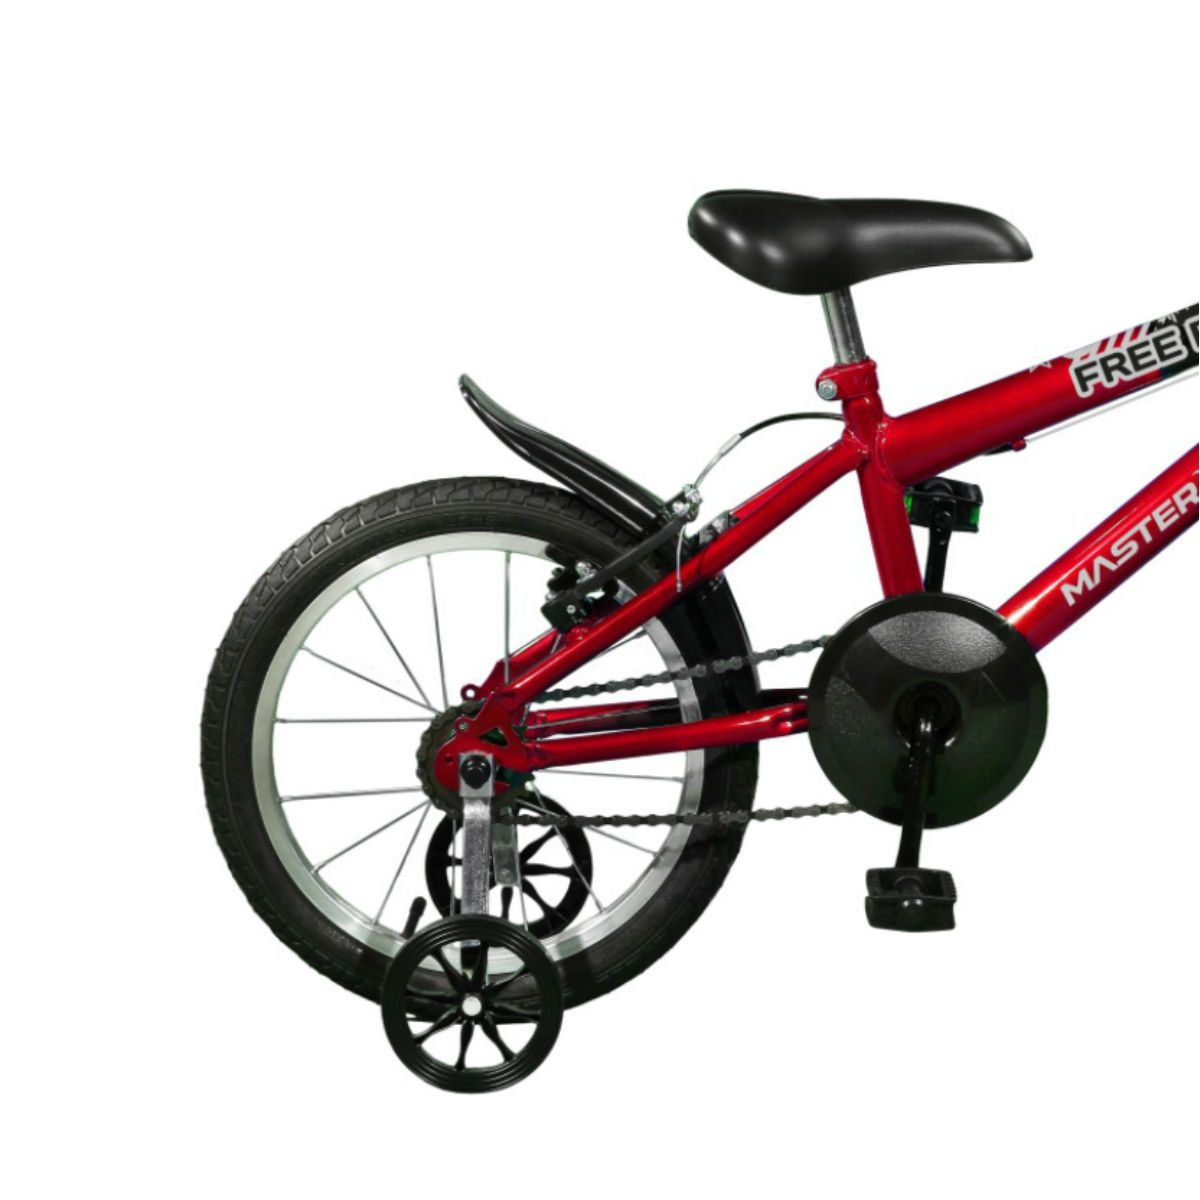 Bicicleta Master Bike Aro 16 Free Boy Freio V-Brake Vermelho/Preto